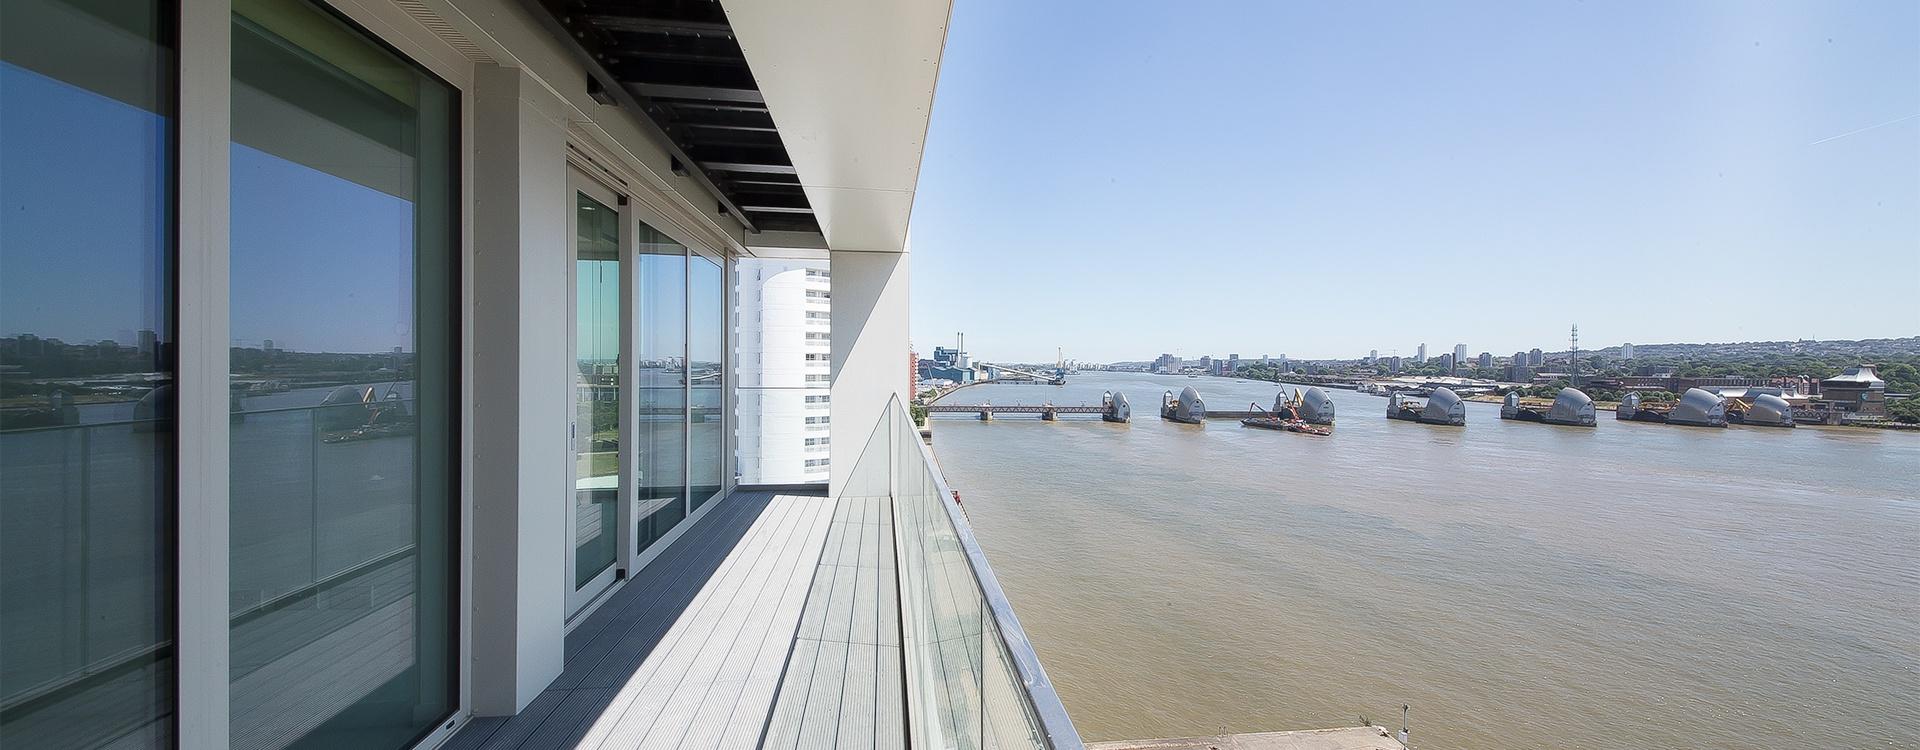 Royal Wharf image